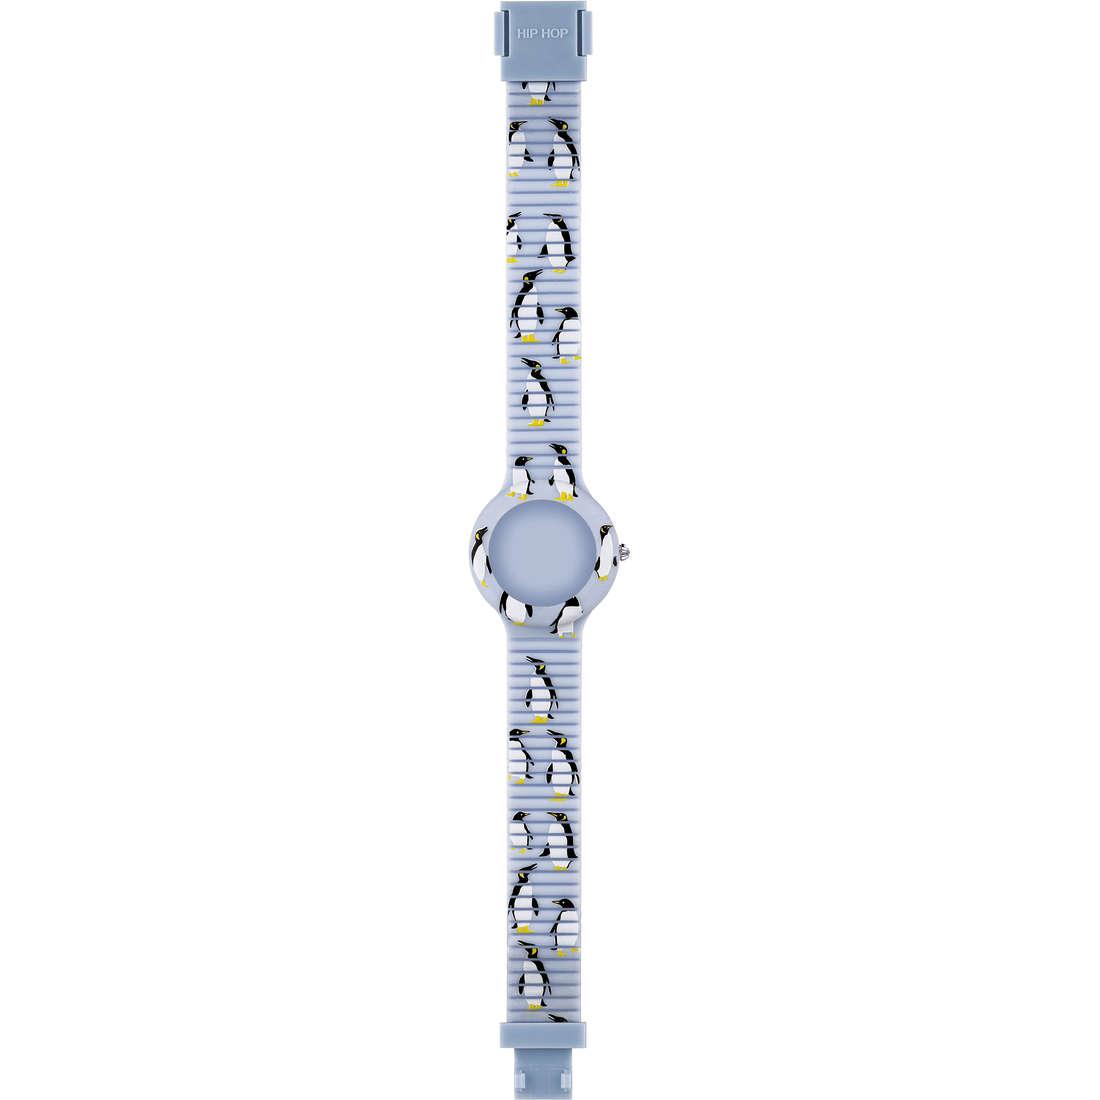 watch accessory woman Hip Hop Animals Add HBU0616